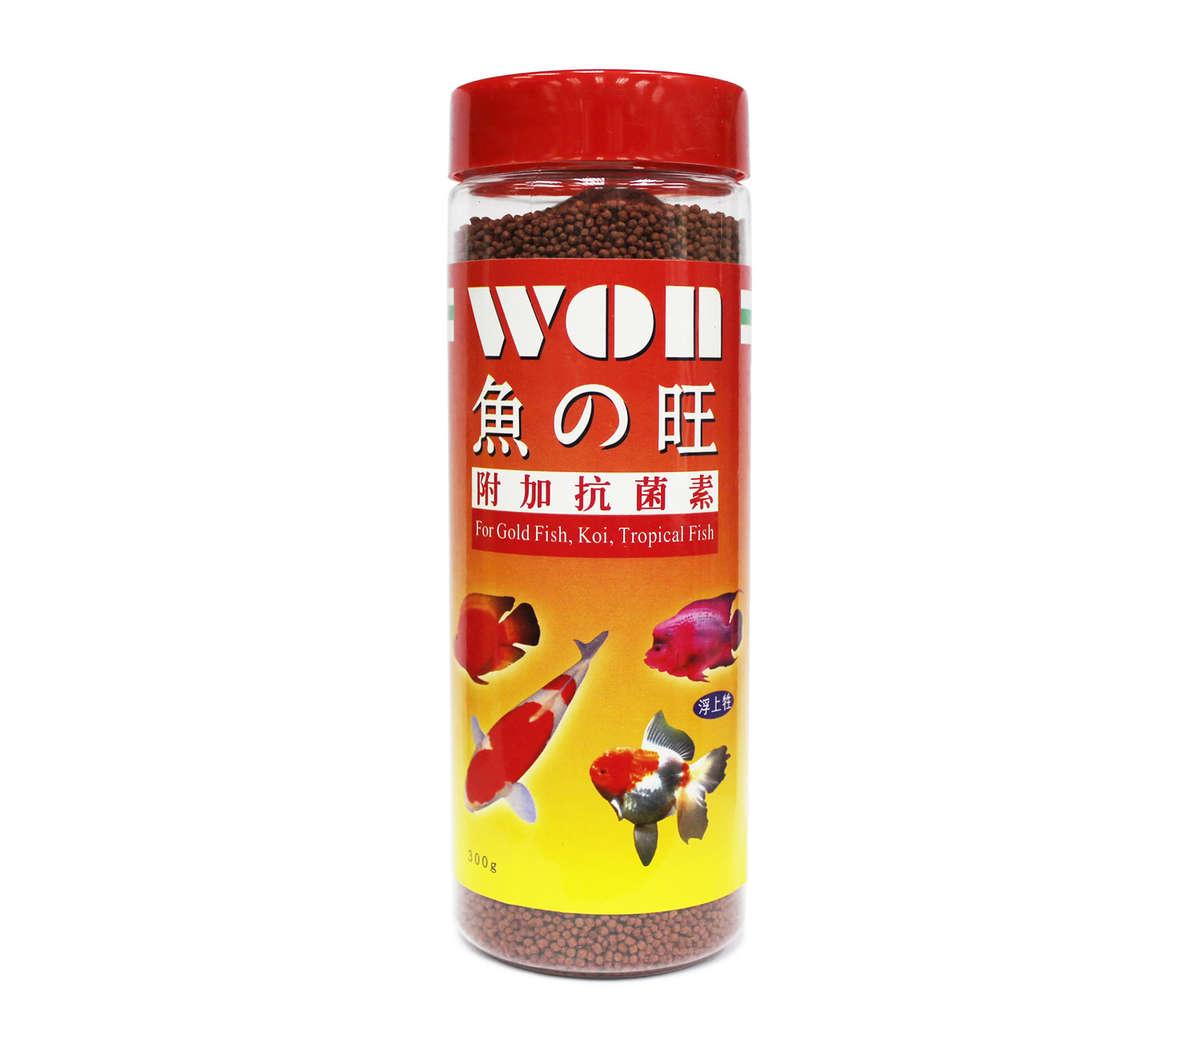 WON | Fish color enhancing food (S) 300g | HKTVmall Online Shopping